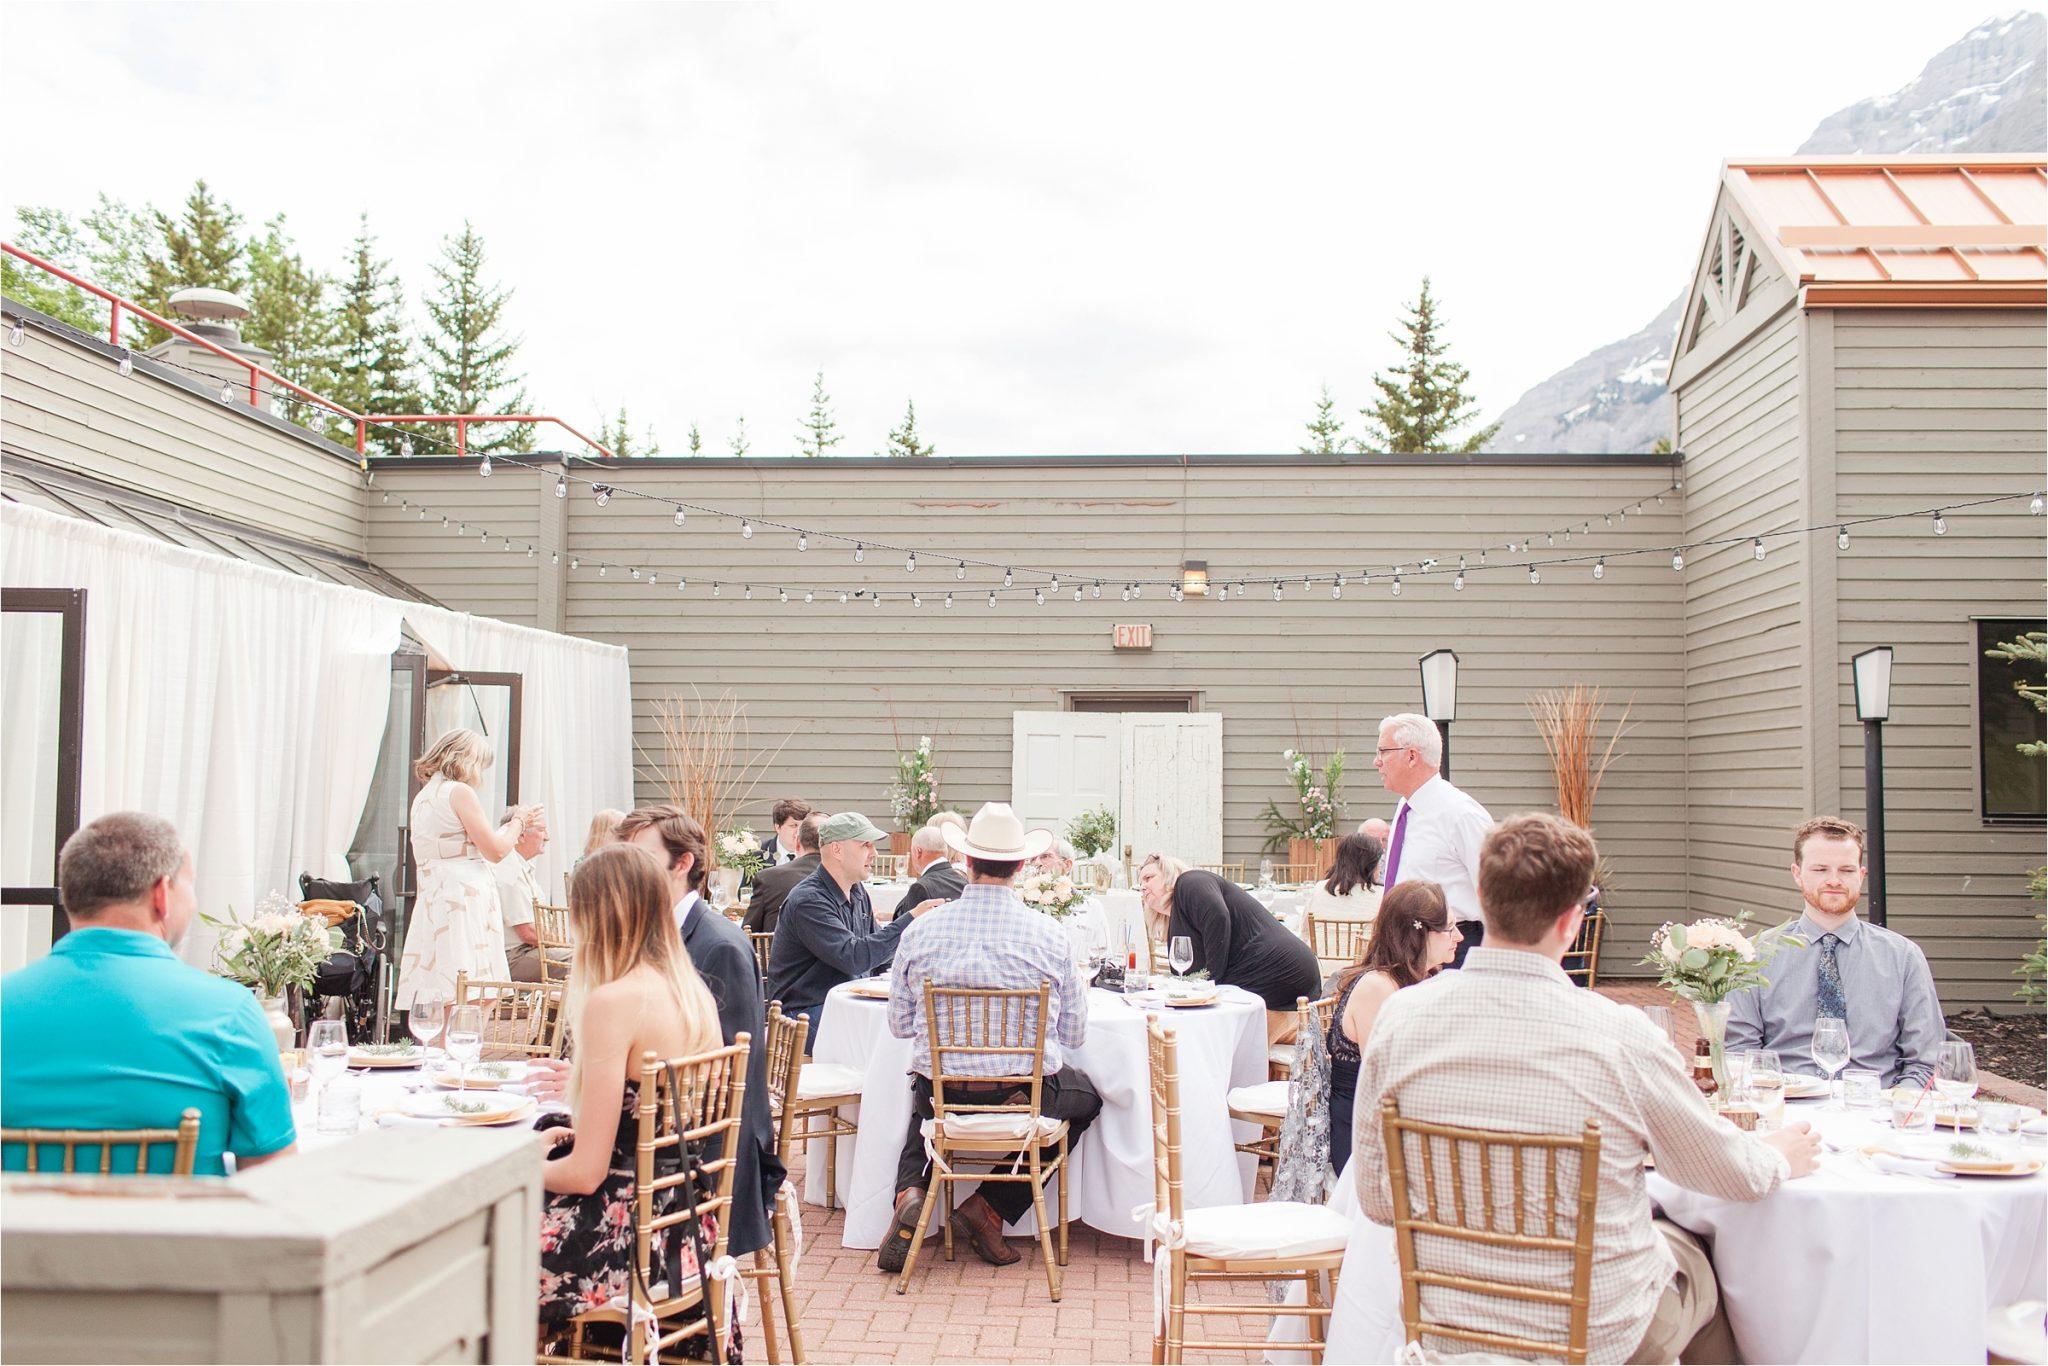 Kananaskis Canada Wedding at the Delta Lodge-Kaitlin & Ricky-Alabama wedding photographer-Lodge wedding-Bridal photography-Outside bridal shoot-Mountain wedding-Mountain wedding-Canada wedding photographer-Outside wedding reception